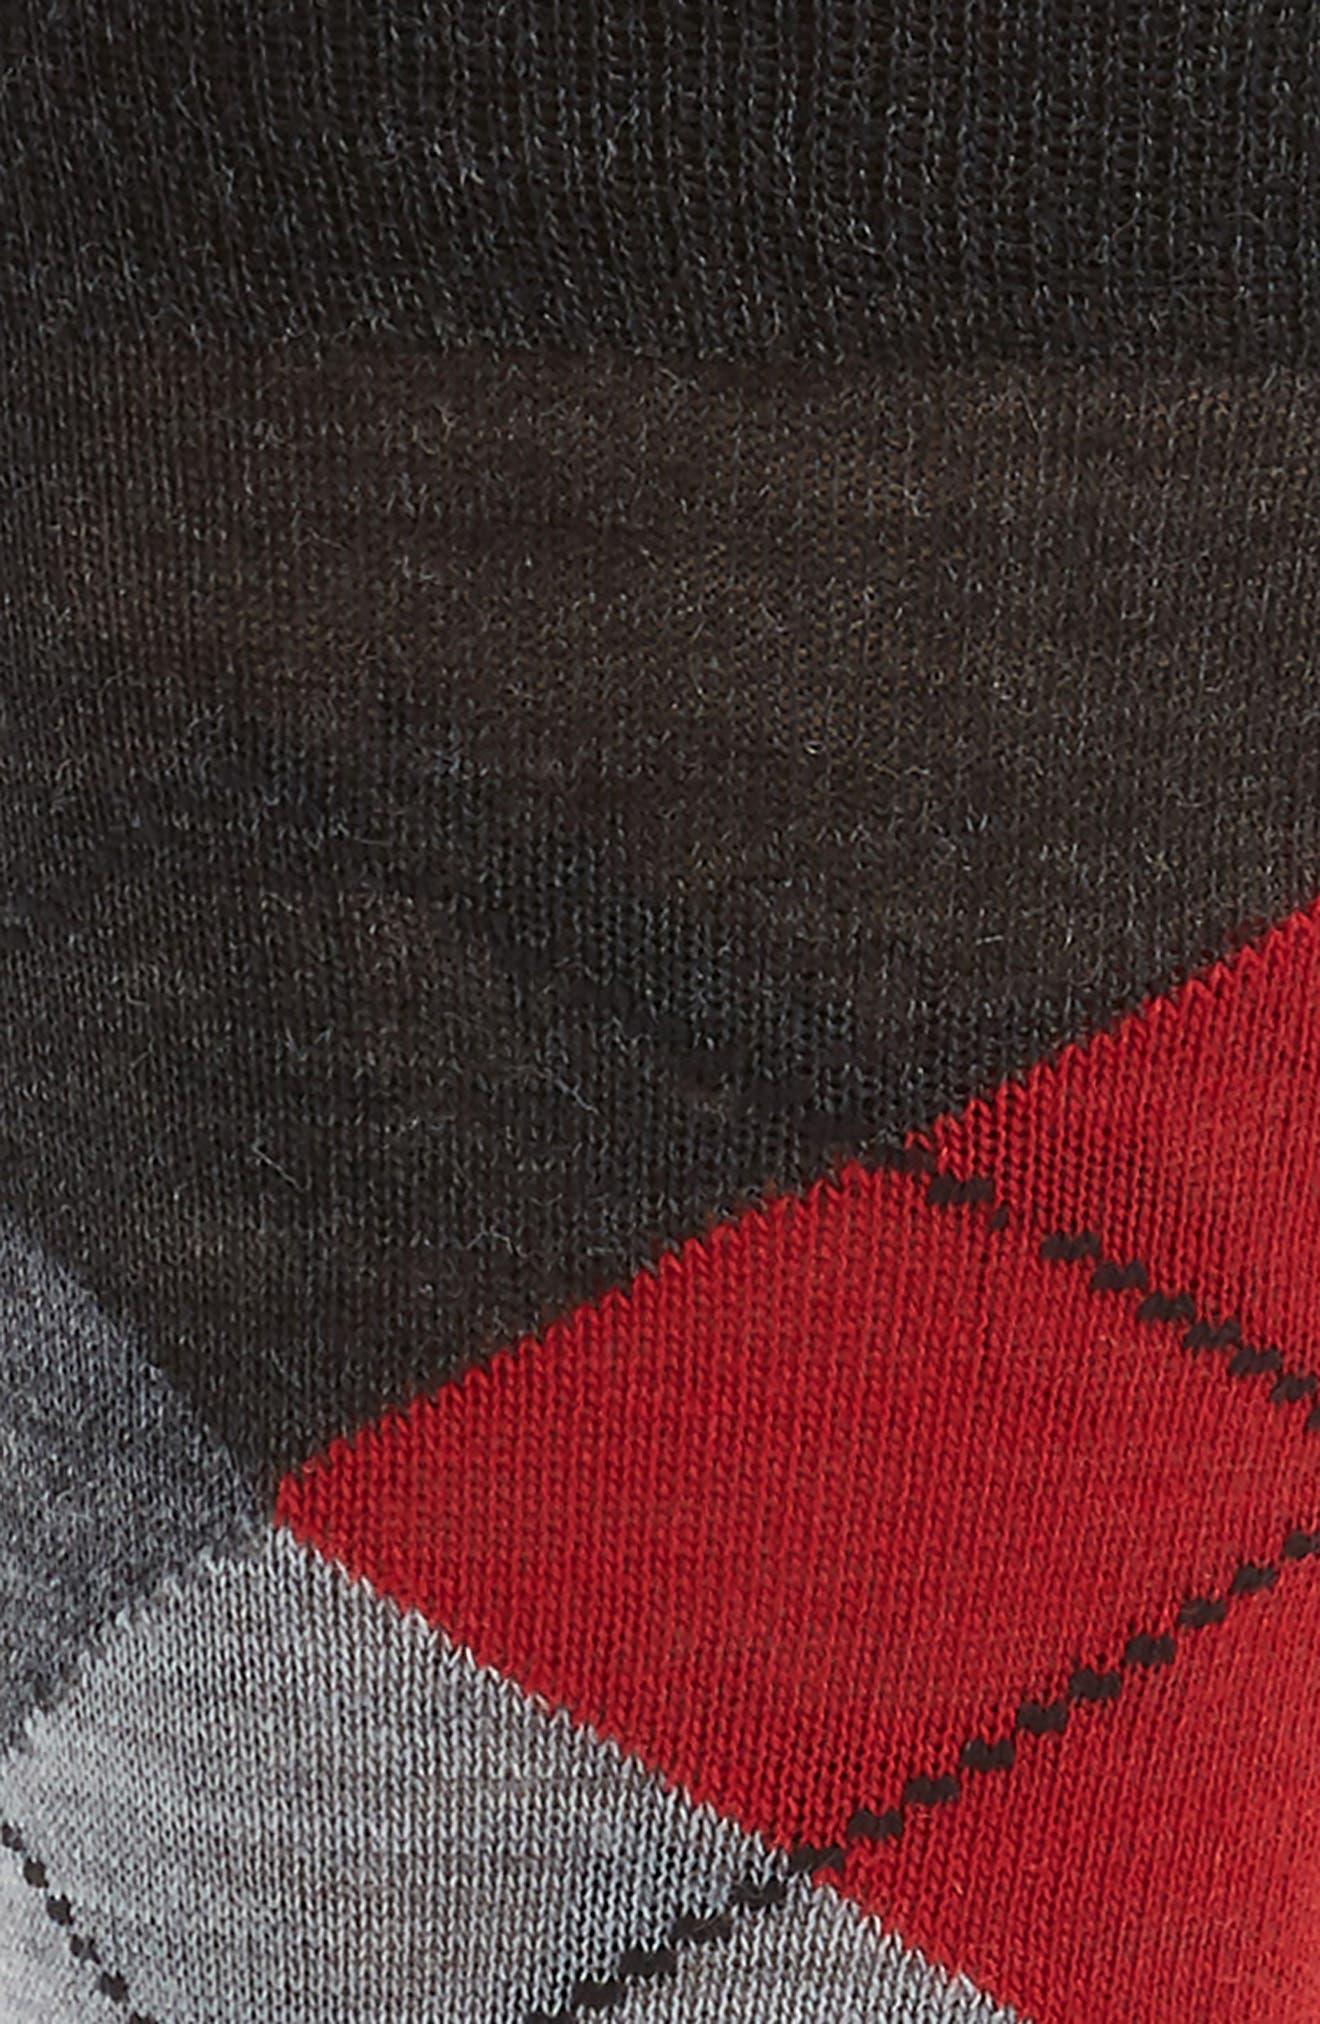 Argyle Socks,                             Alternate thumbnail 2, color,                             Charcoal